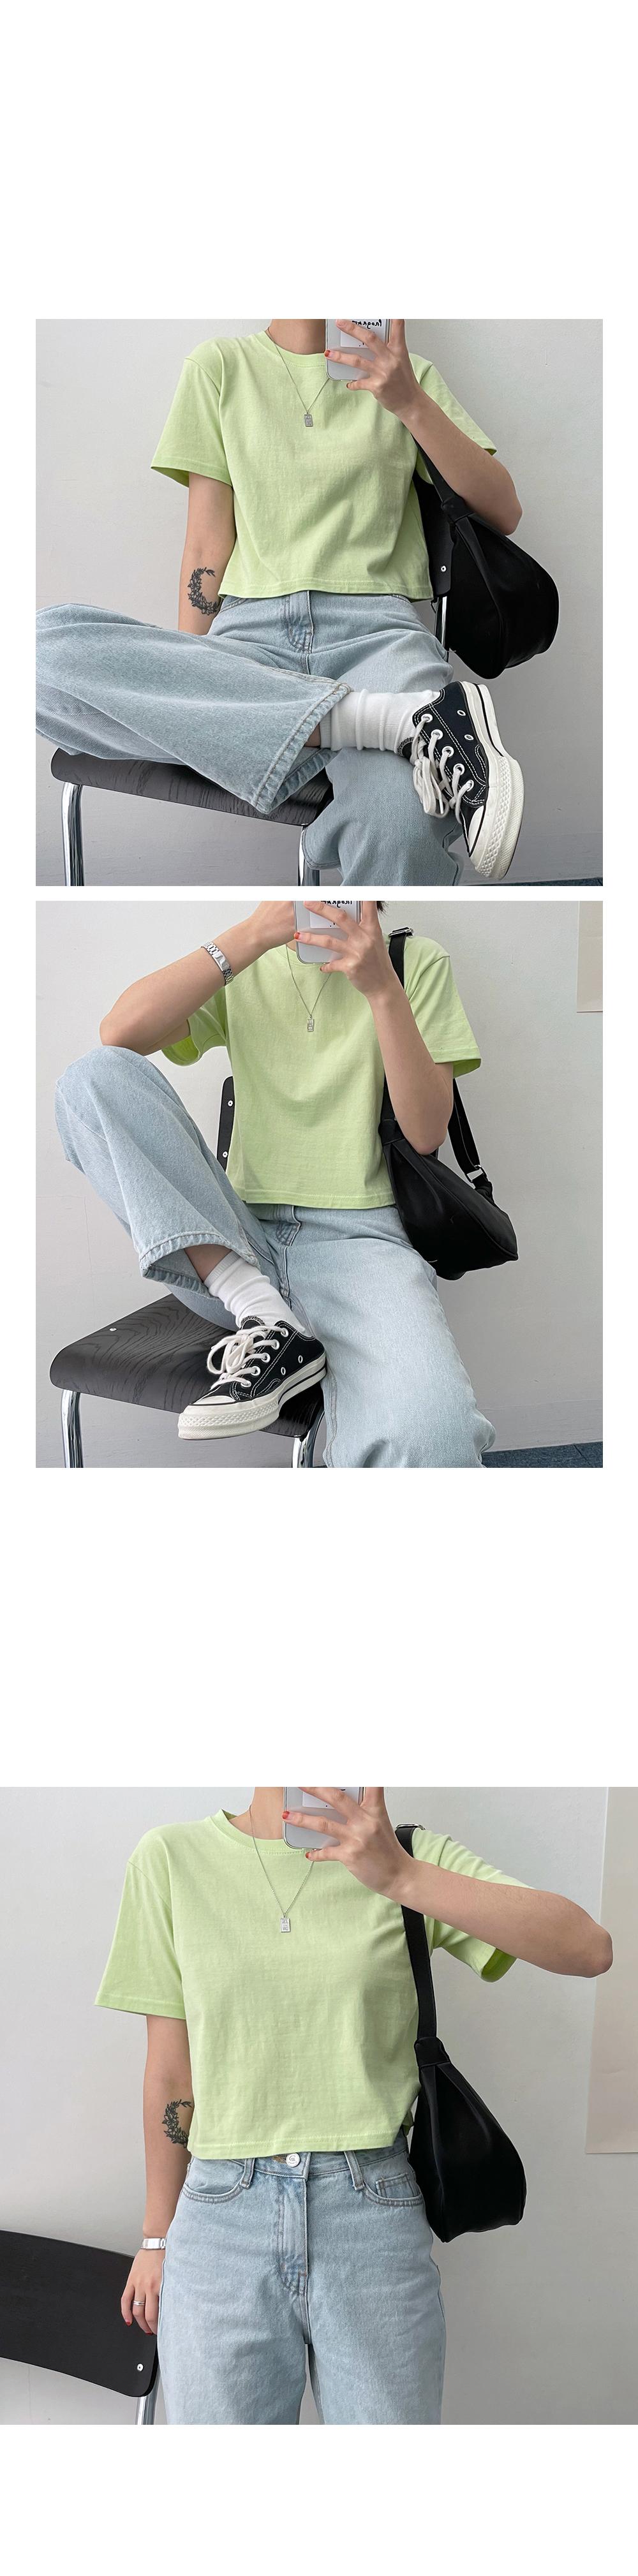 dress model image-S1L21